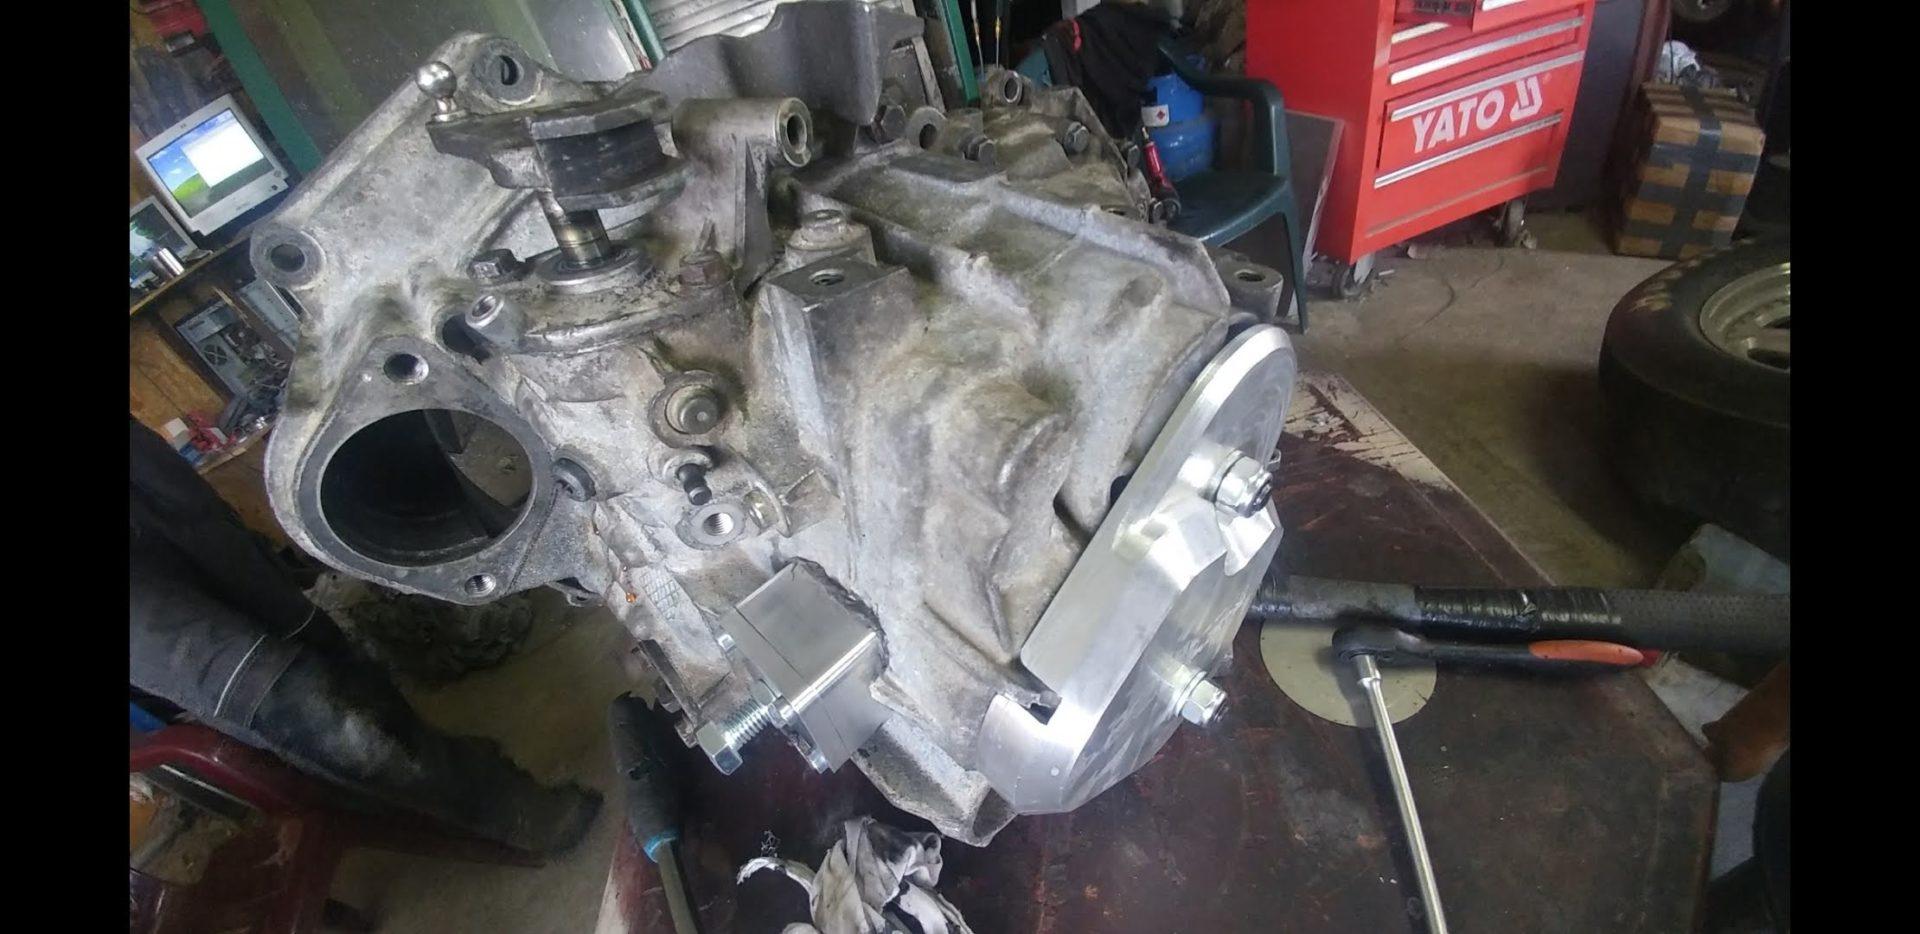 6f50 transmission manual